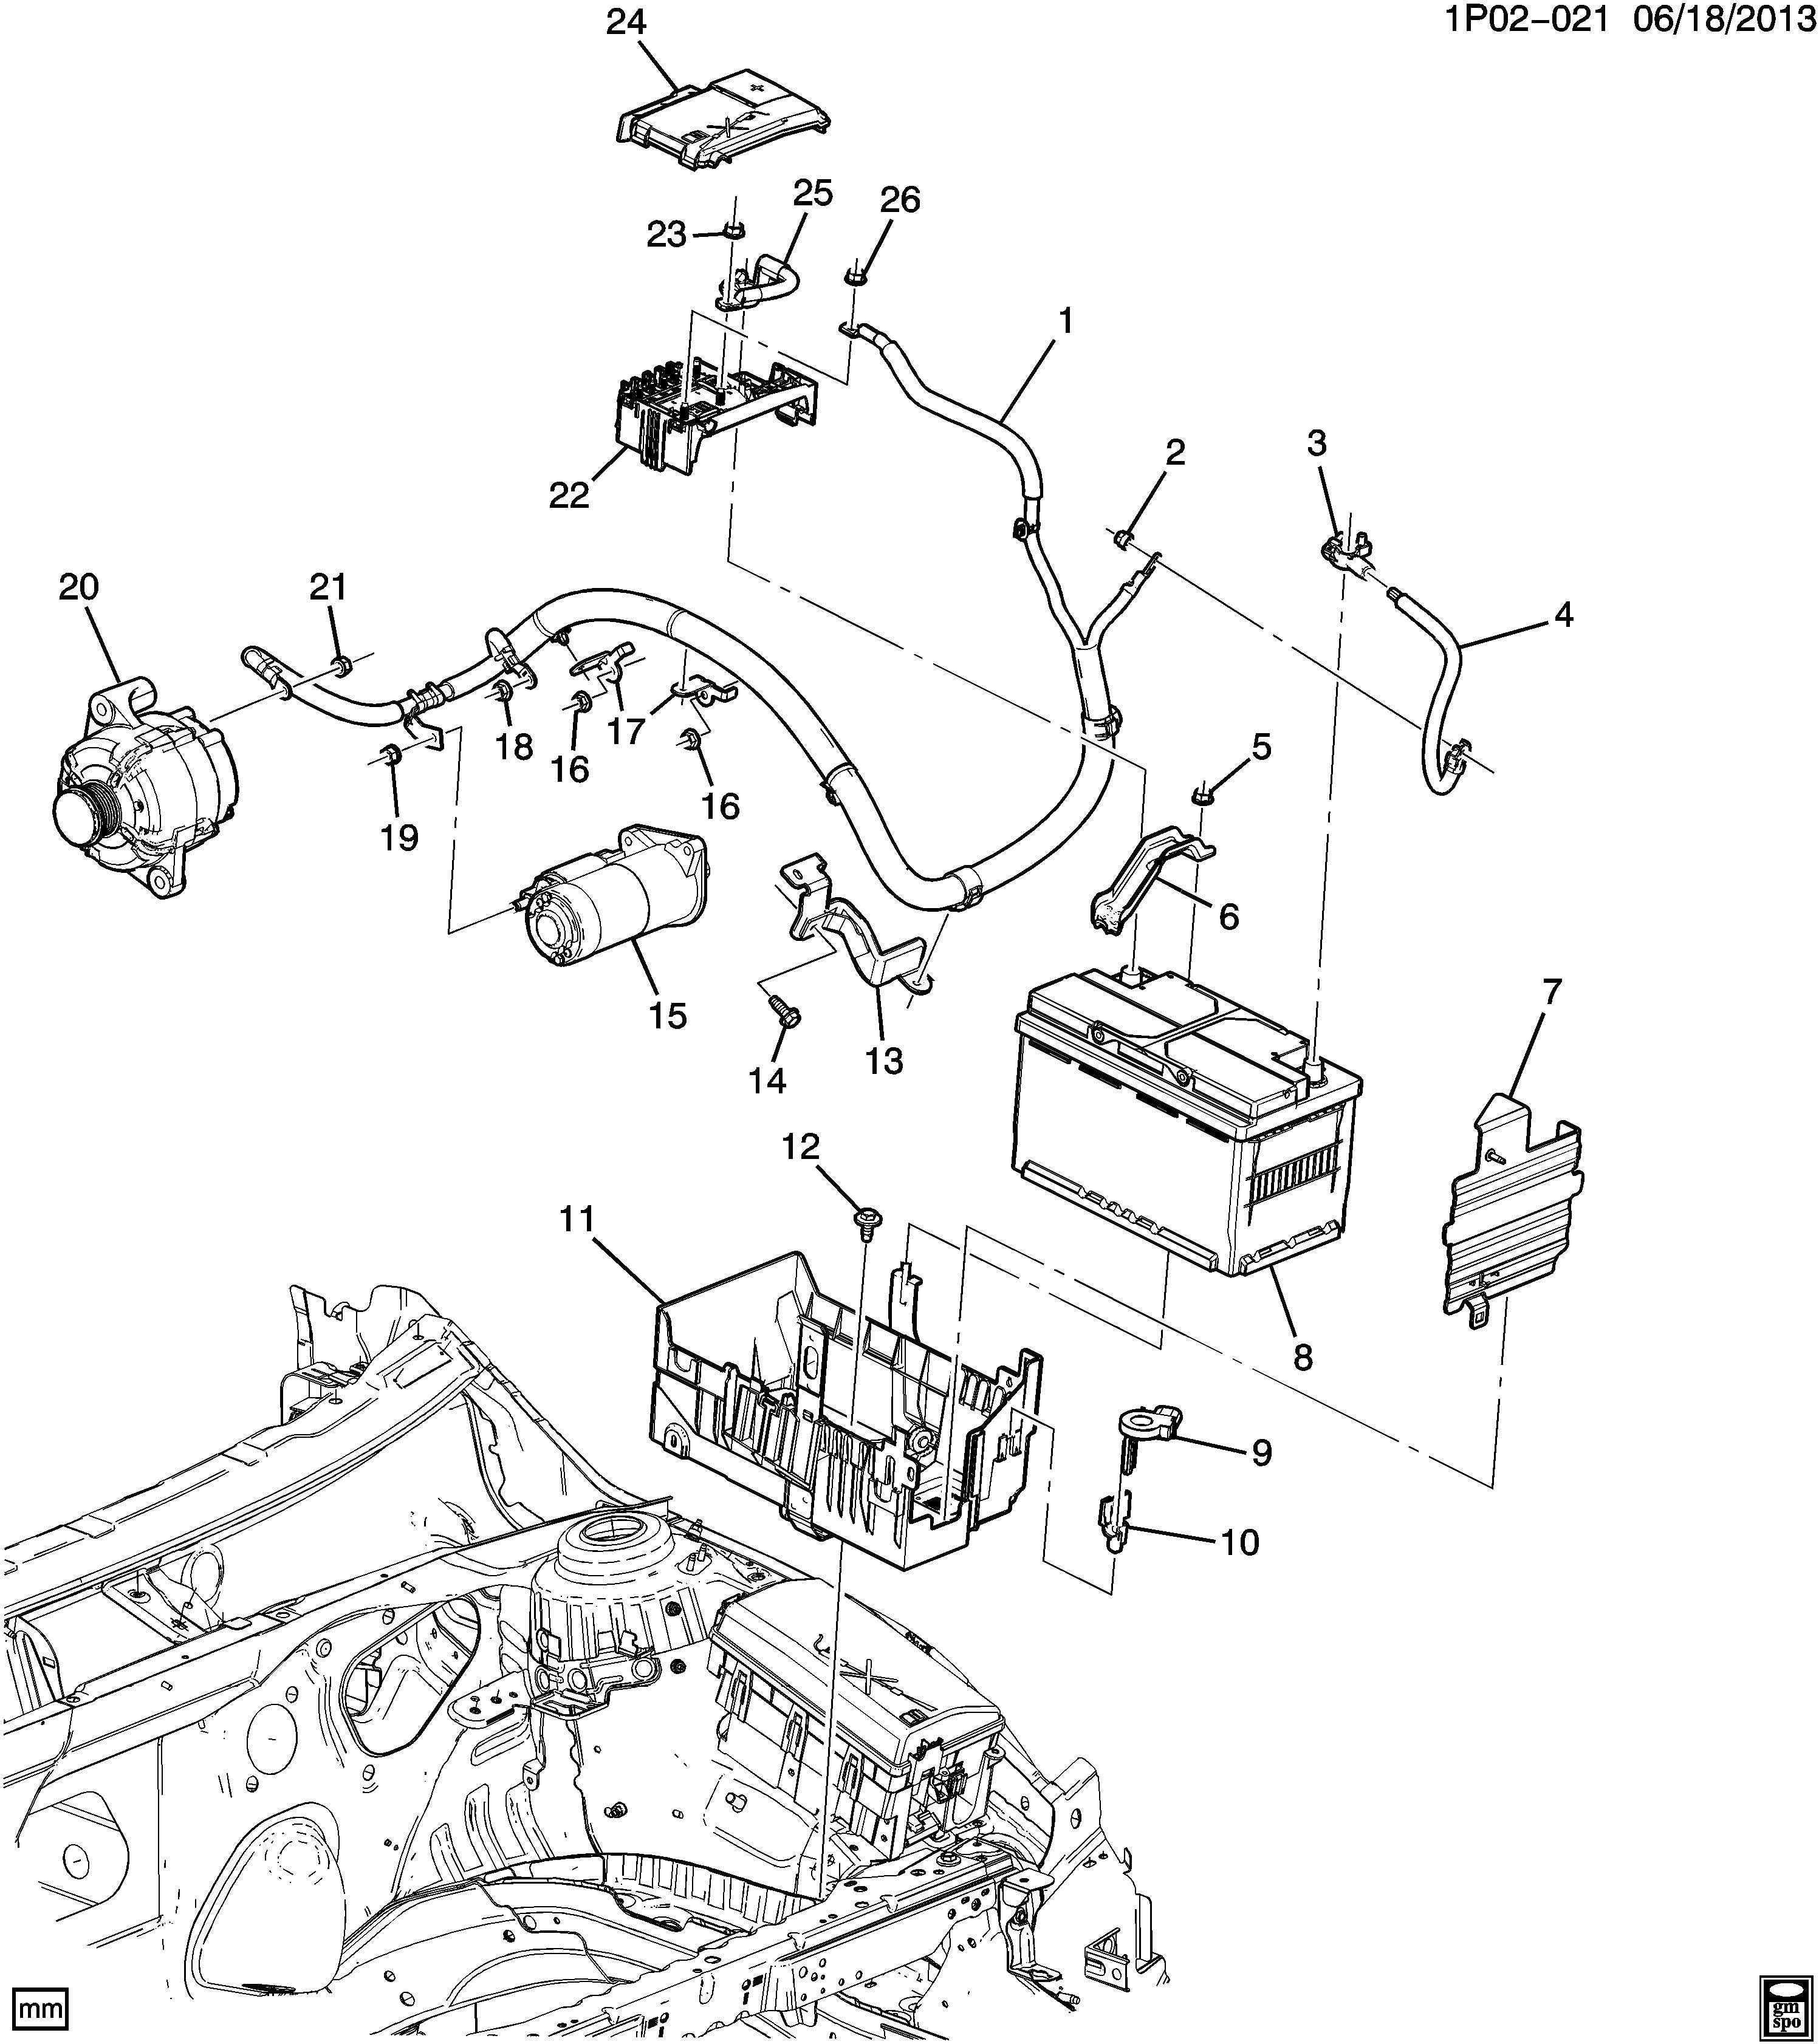 Diagram Chevy Cruze Wiring Diagrams Full Version Hd